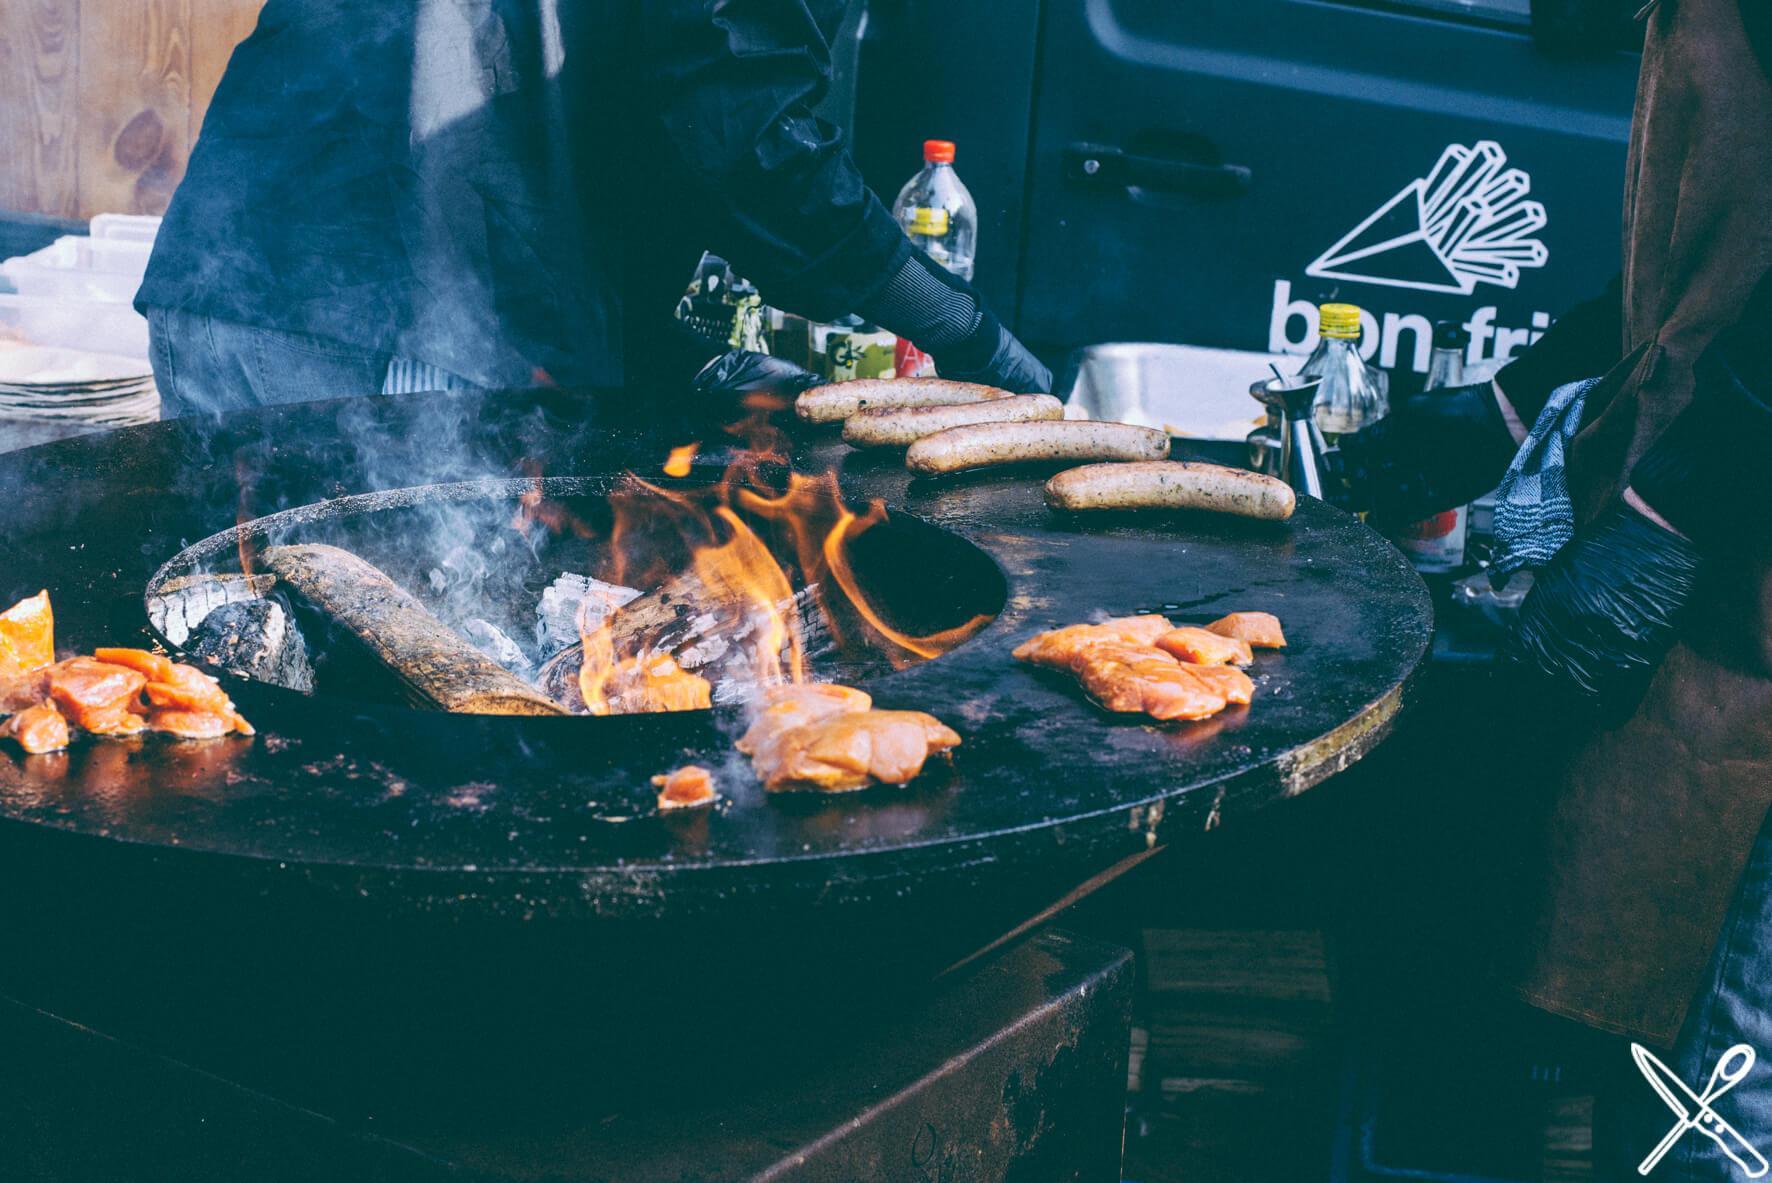 Bon Frites Street Food Festival Anbieter.jpg